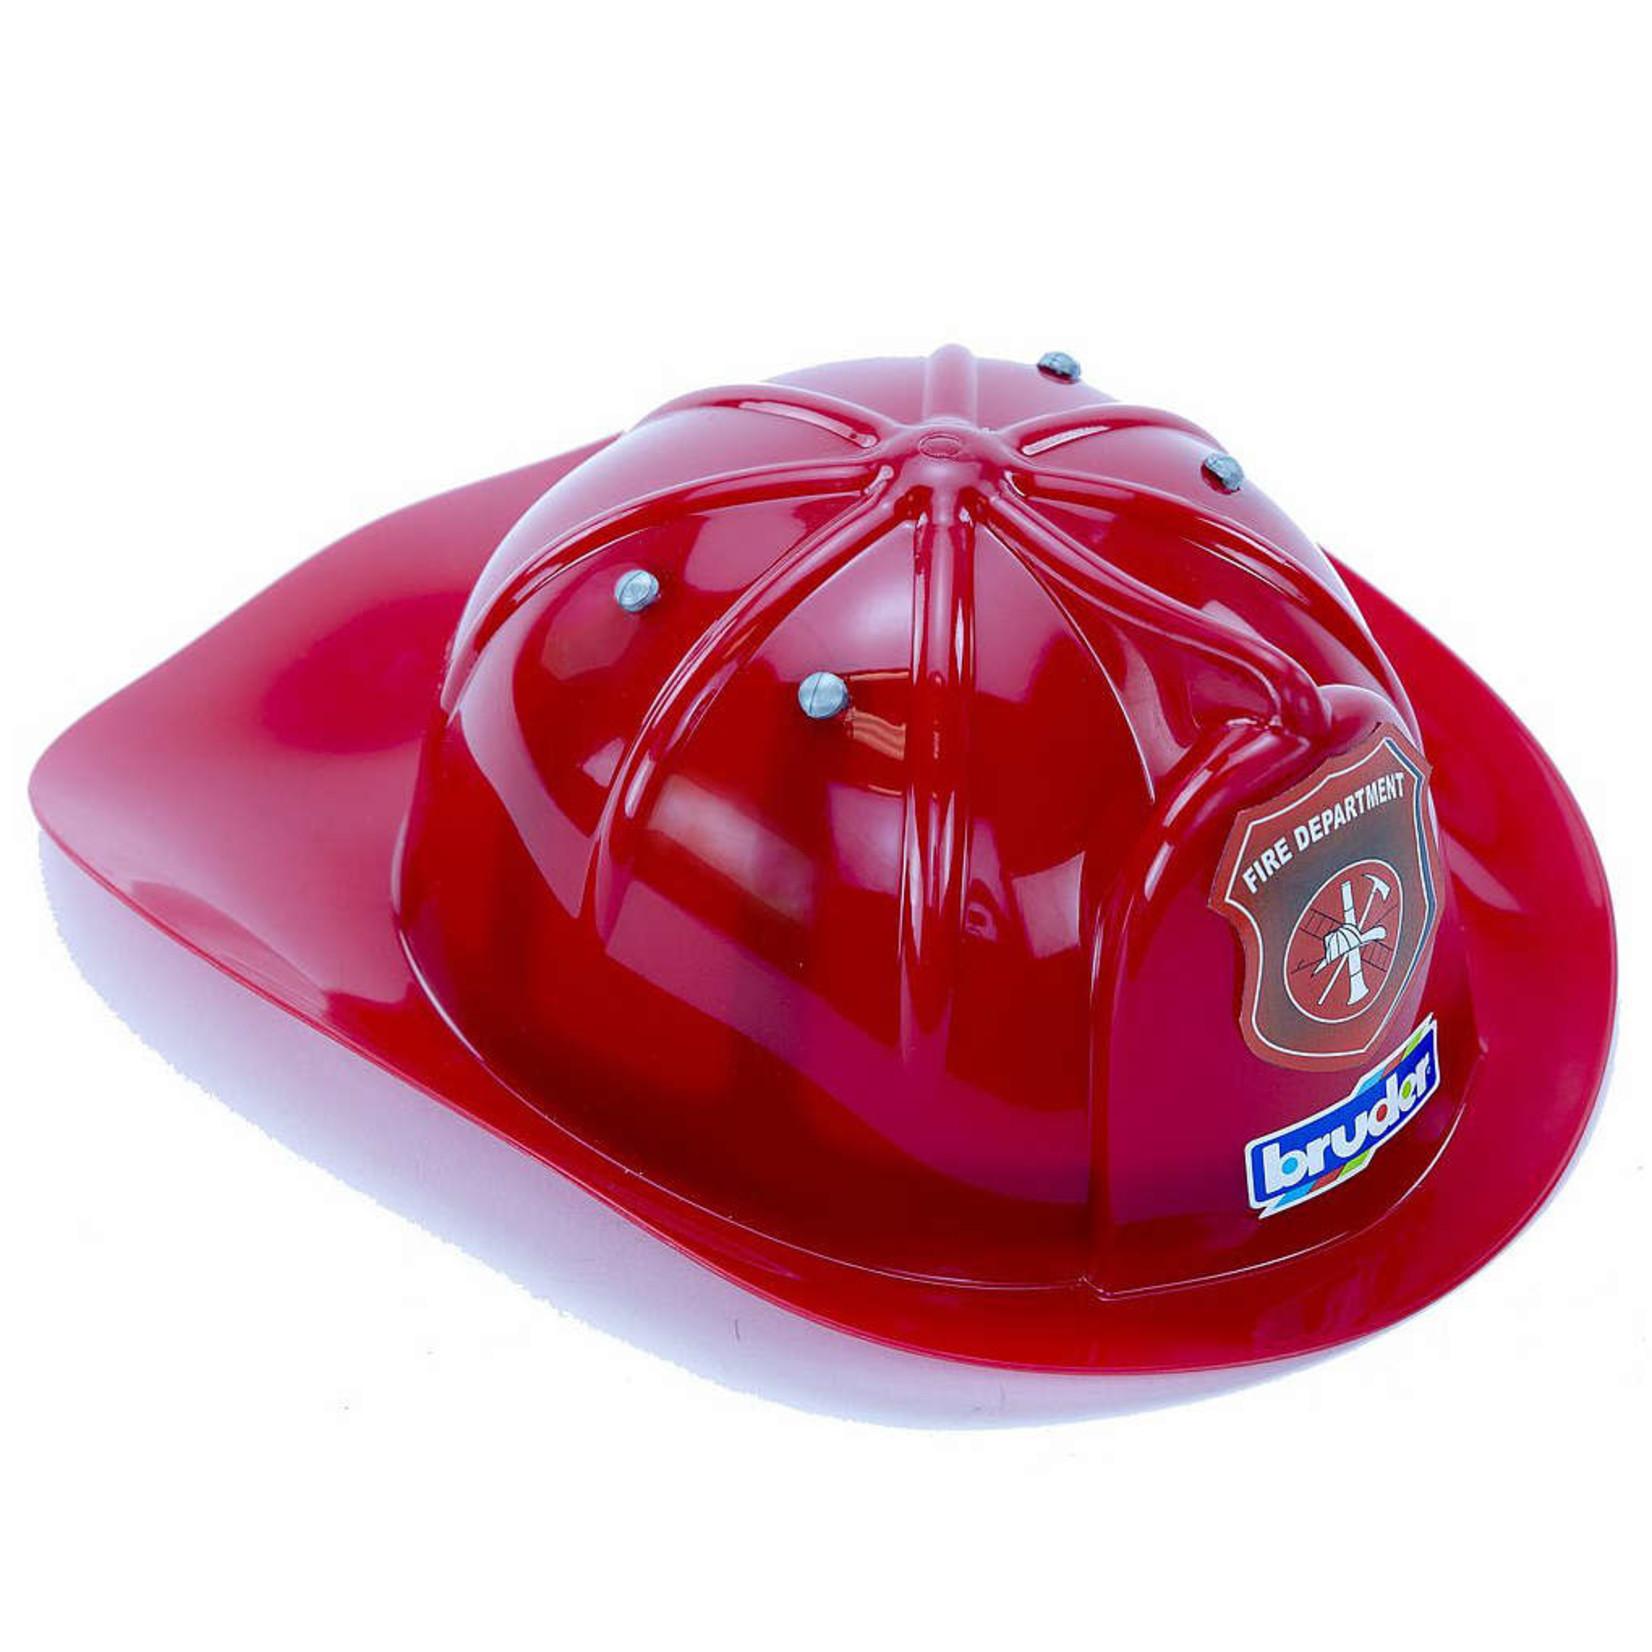 BRUDER RED FIRE HELMET